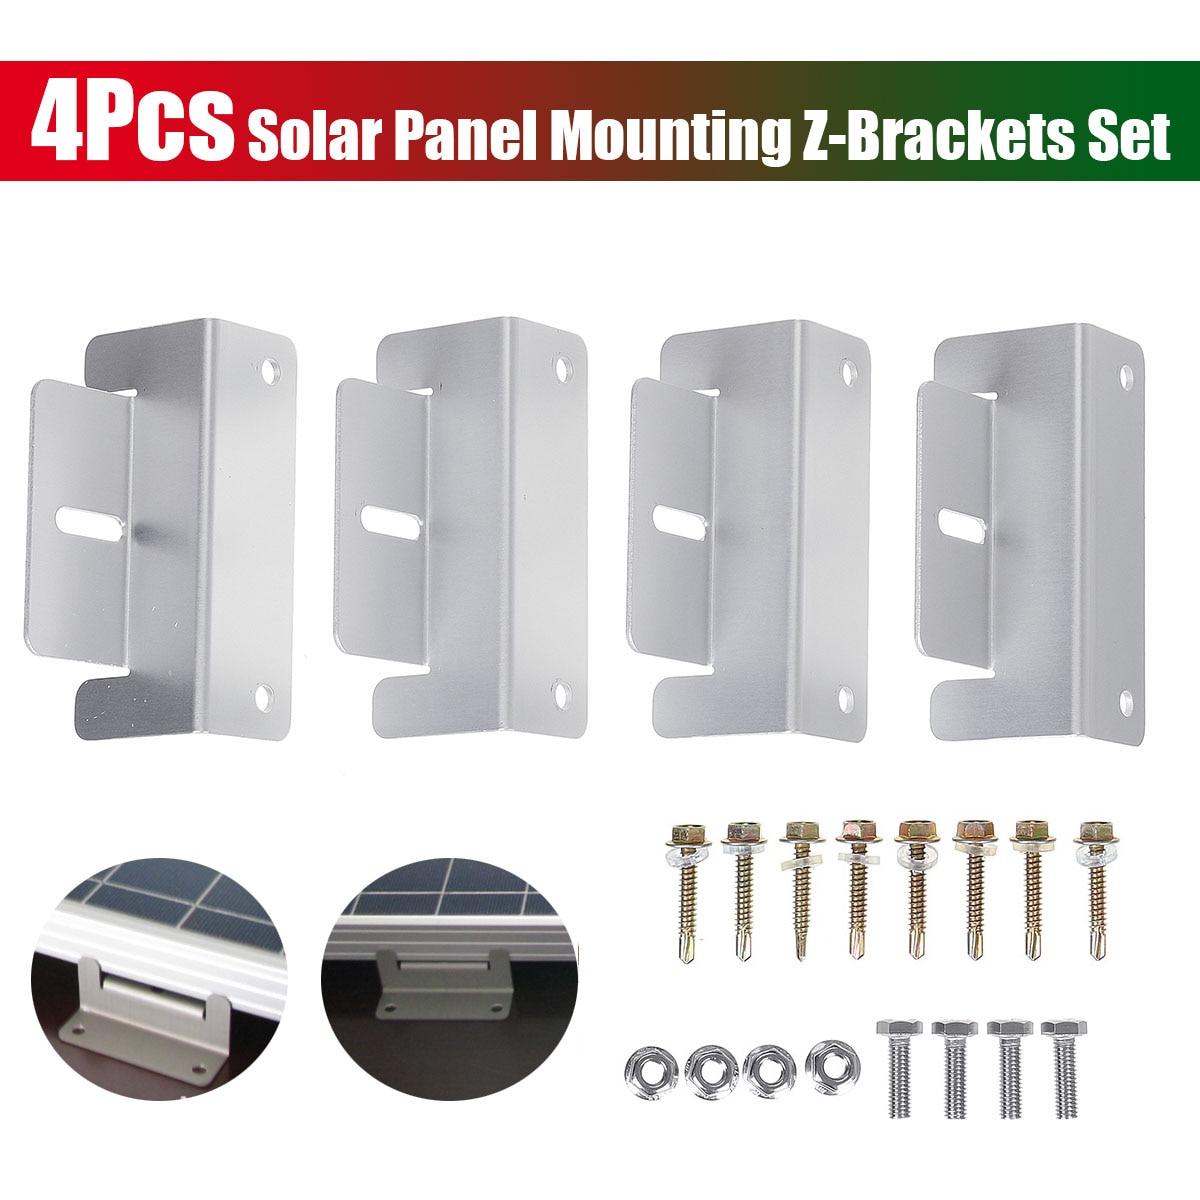 4pcs Mounting Bracket Set Frame Kits For Solar Panel Kits Adhesive Bond Caravan Boat|Solar Accessories| |  - title=